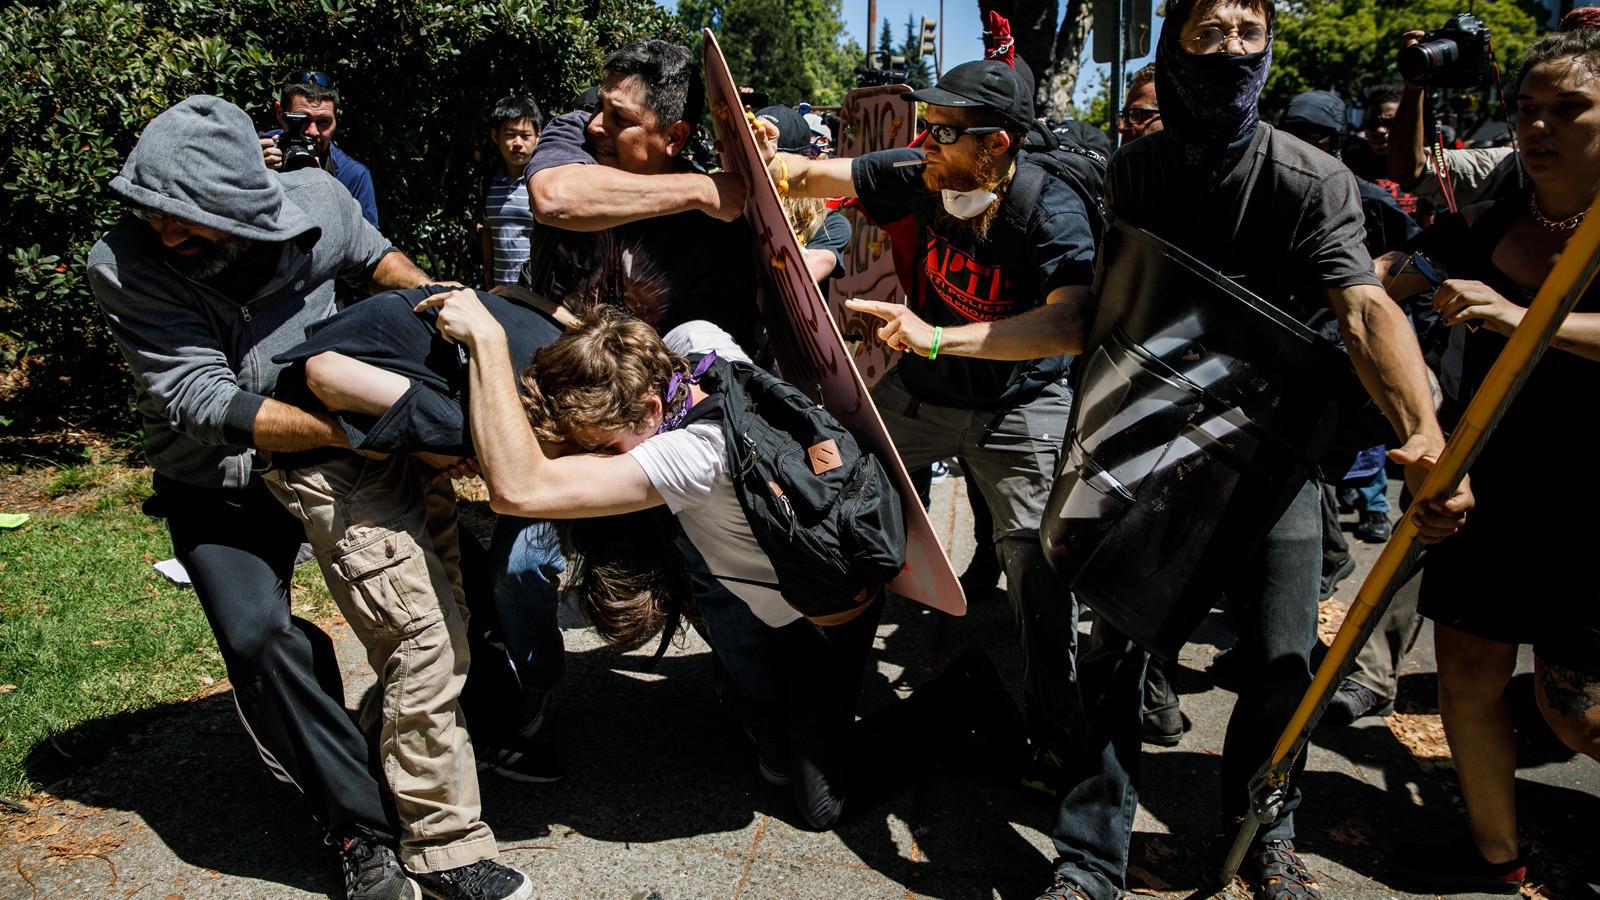 After 'antifa' violence, Berkeley debates whether Milo ...